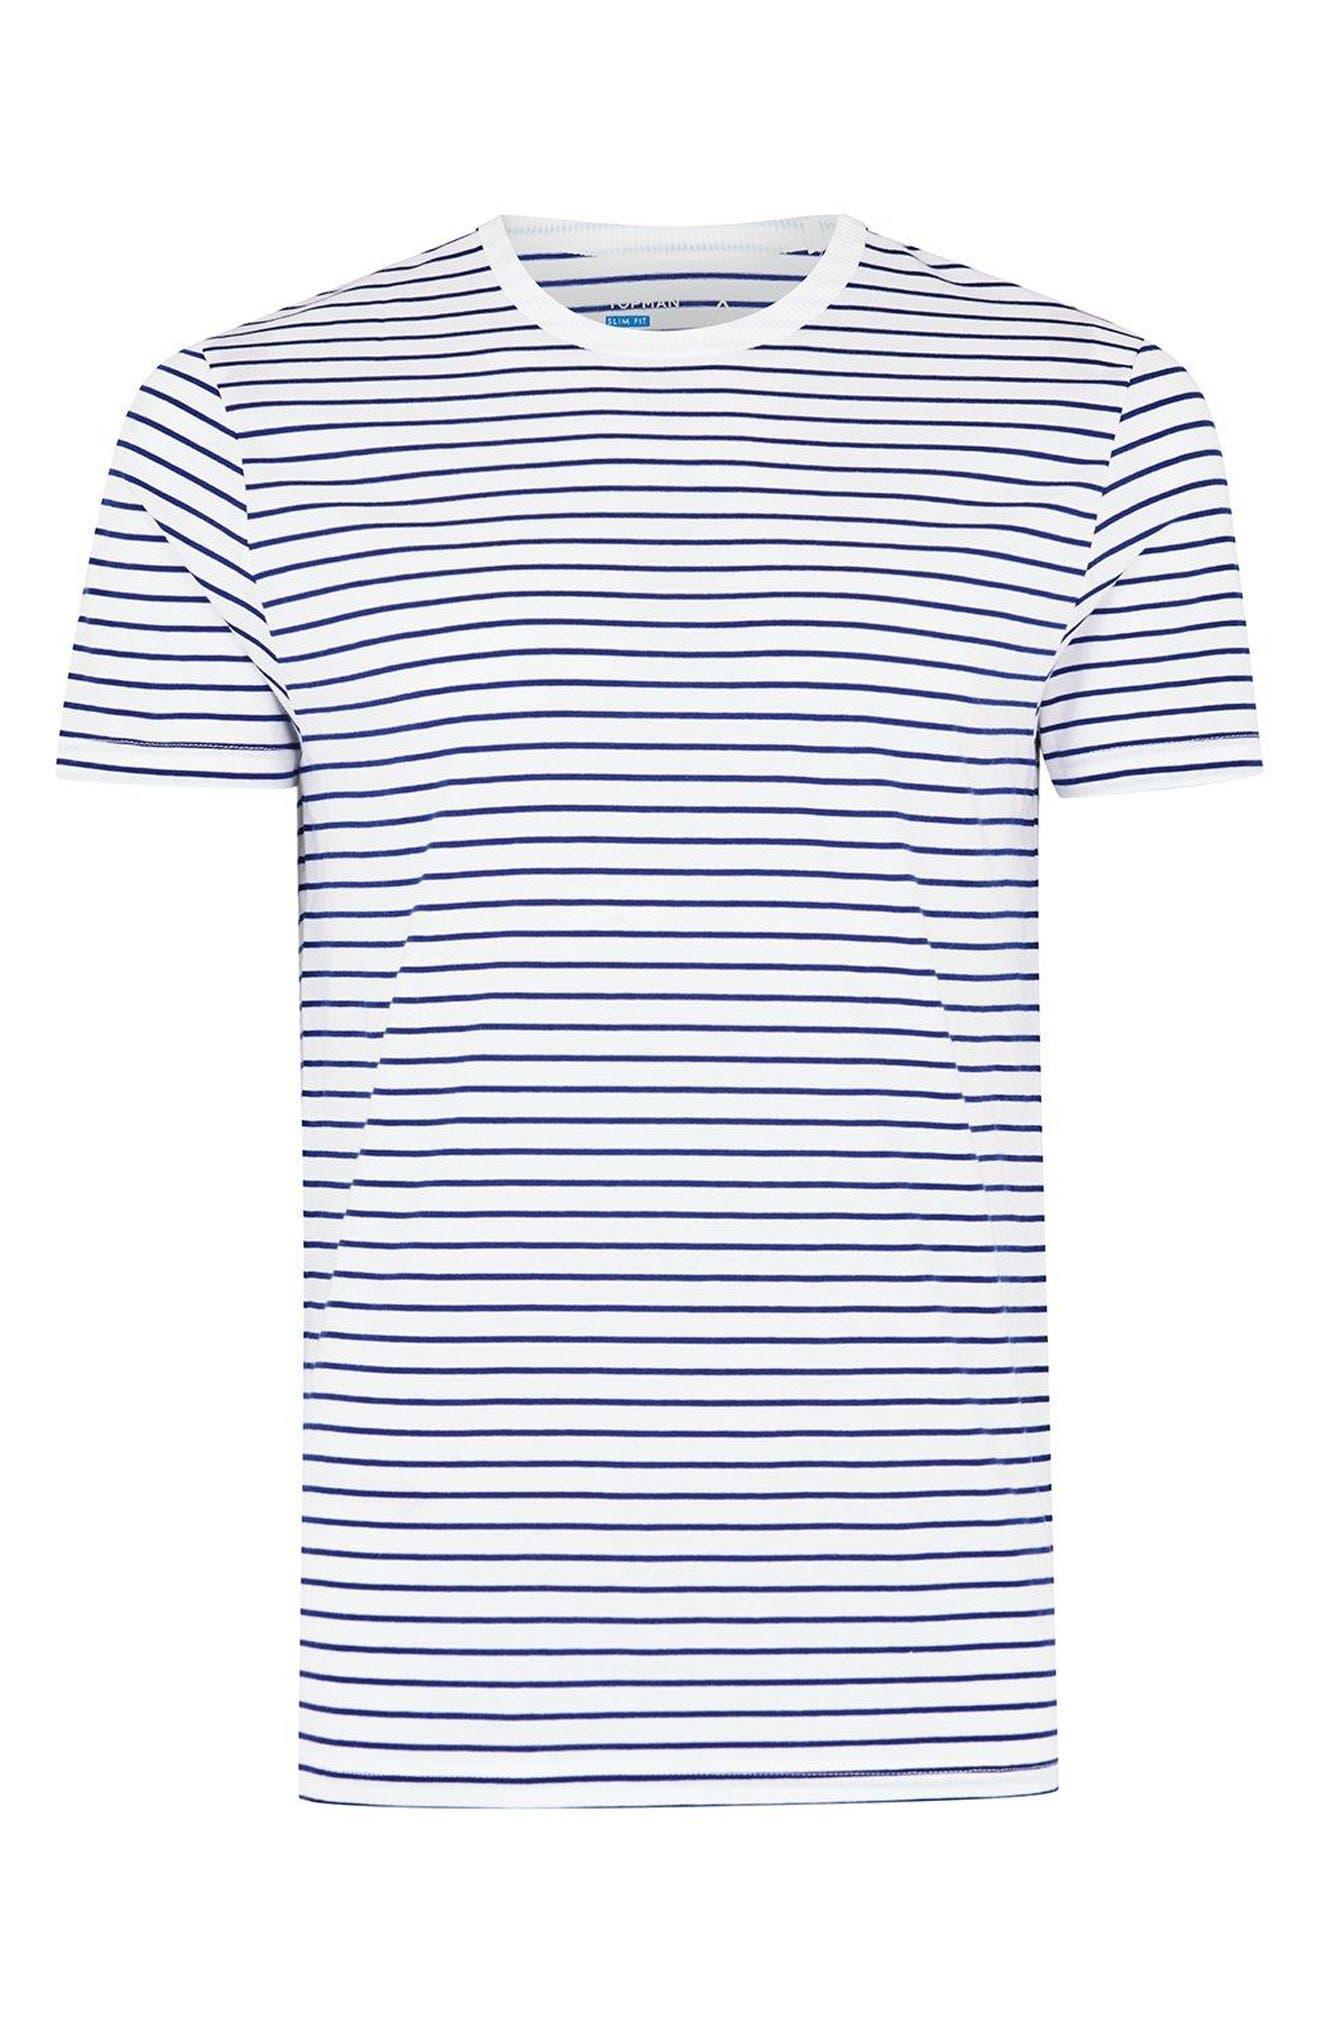 Slim Fit Stripe T-Shirt,                             Alternate thumbnail 3, color,                             DARK BLUE MULTI